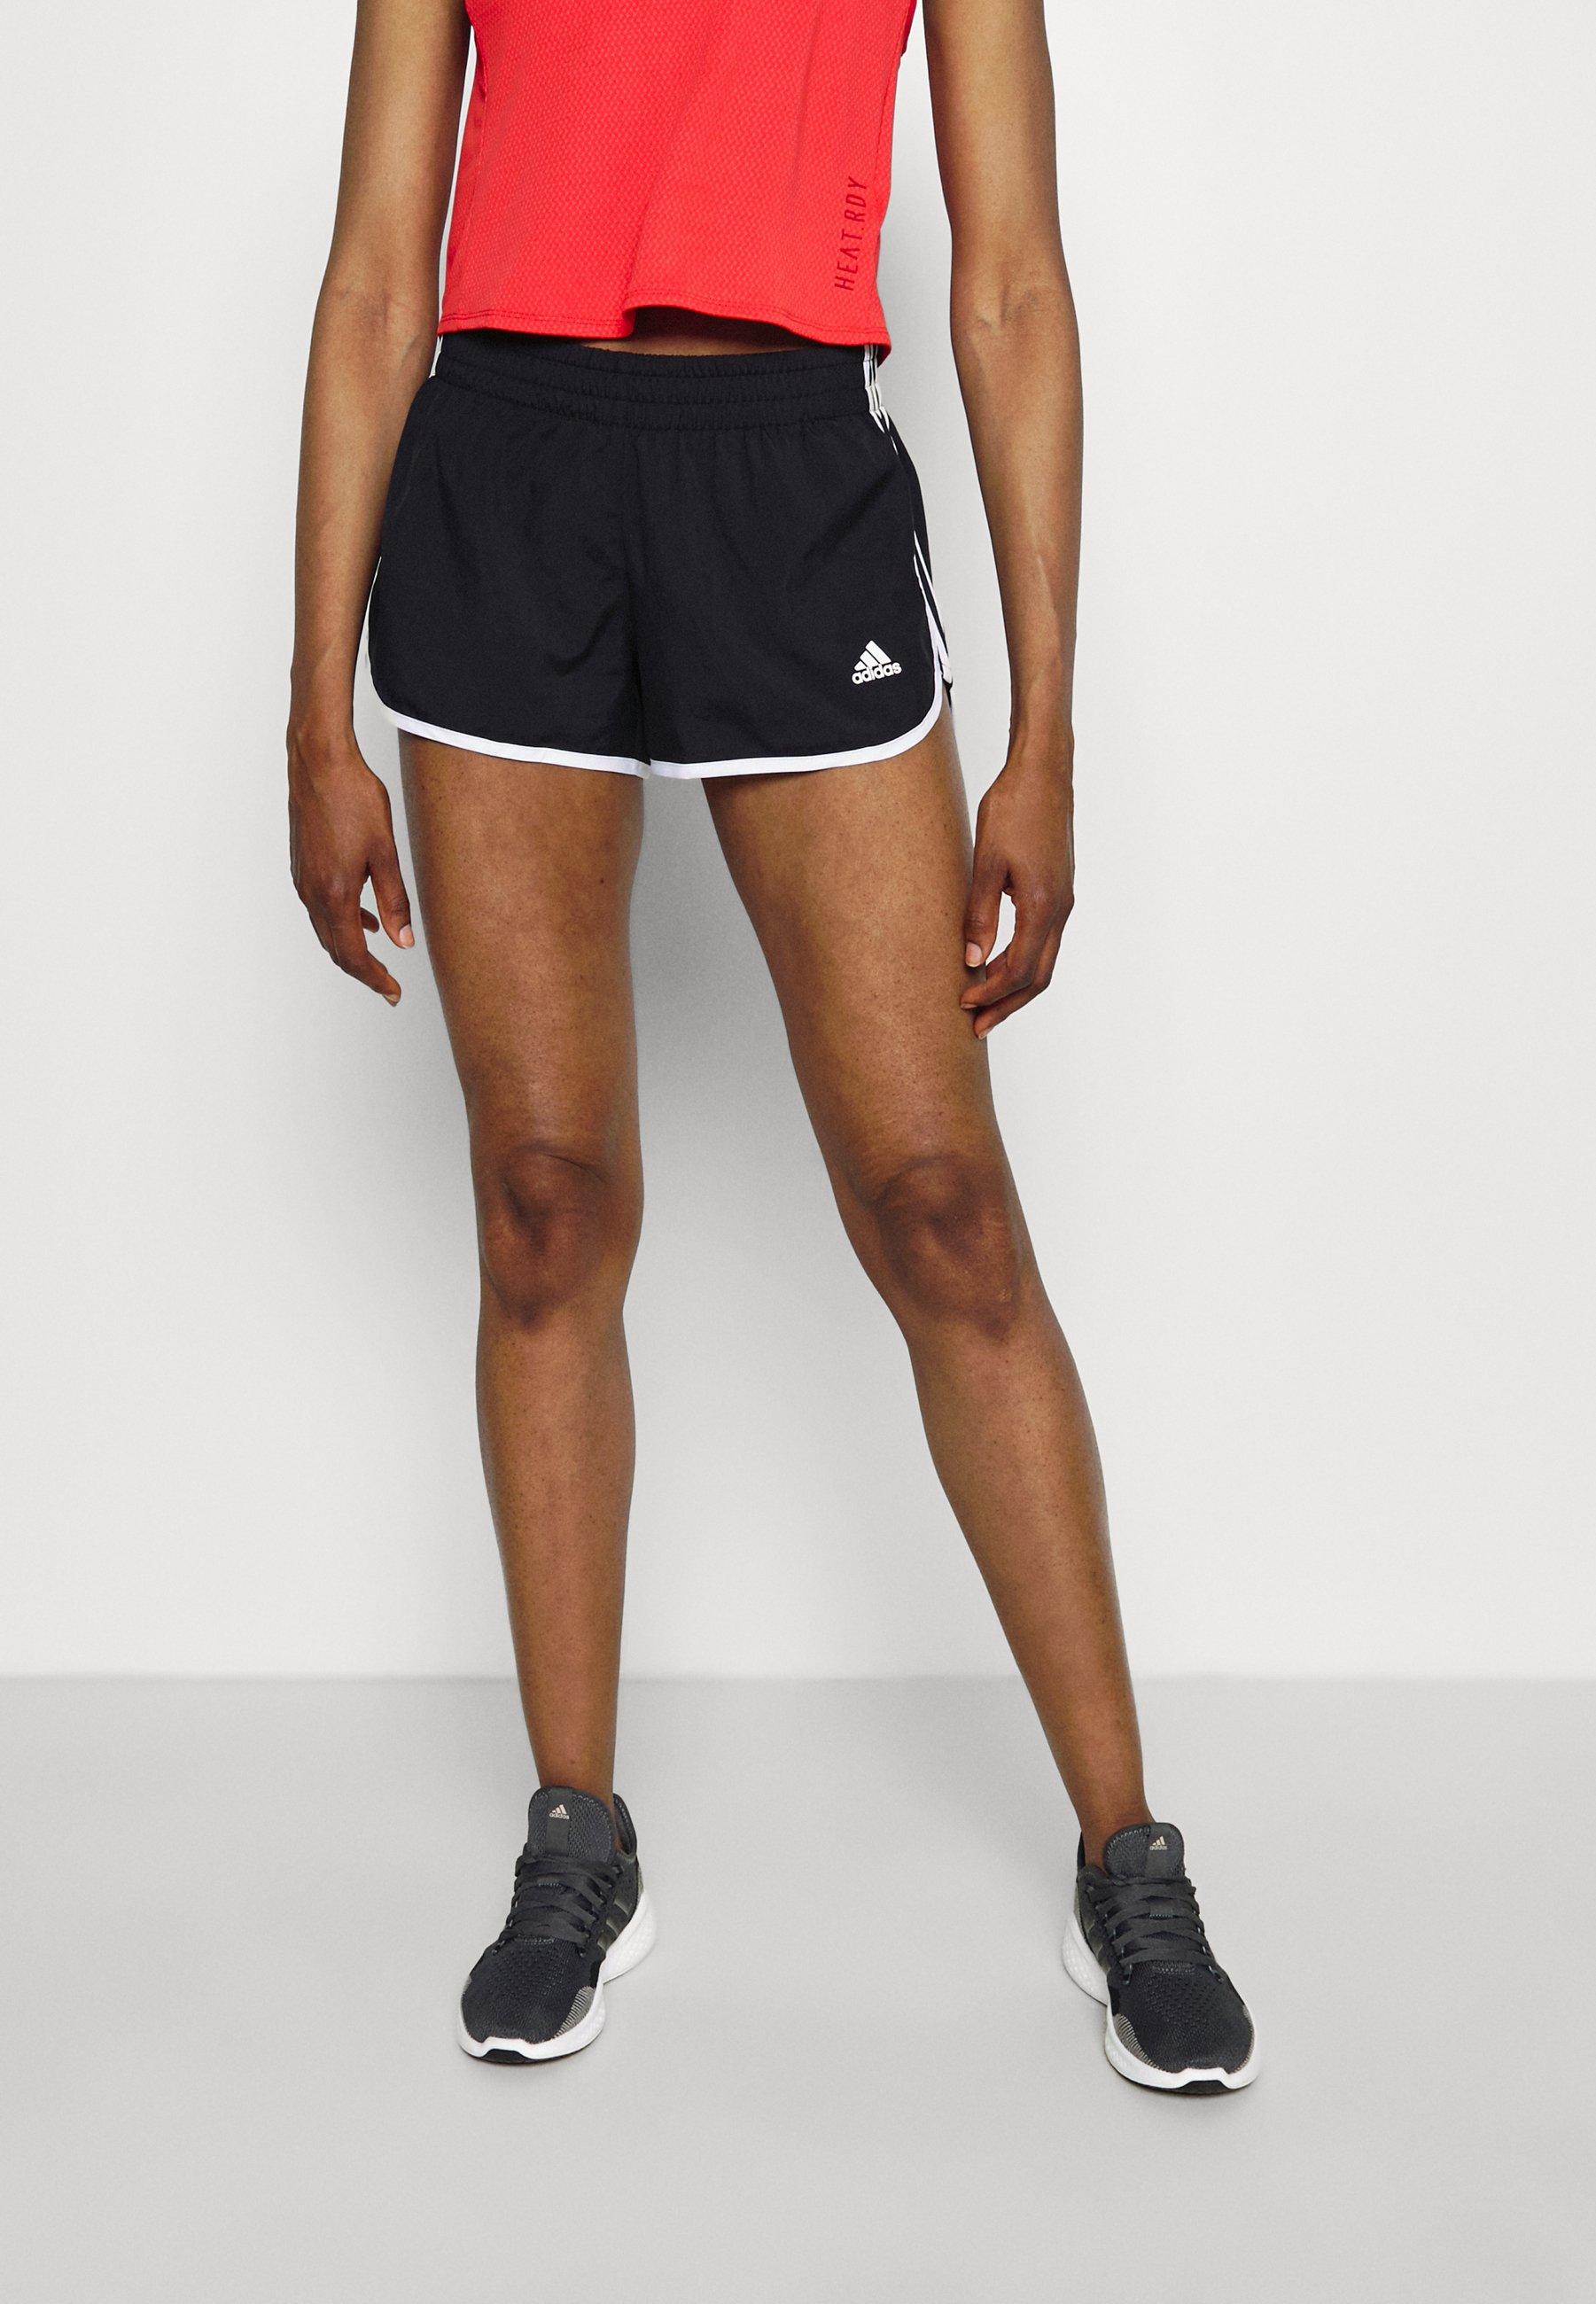 Damen M20 SHORT - kurze Sporthose